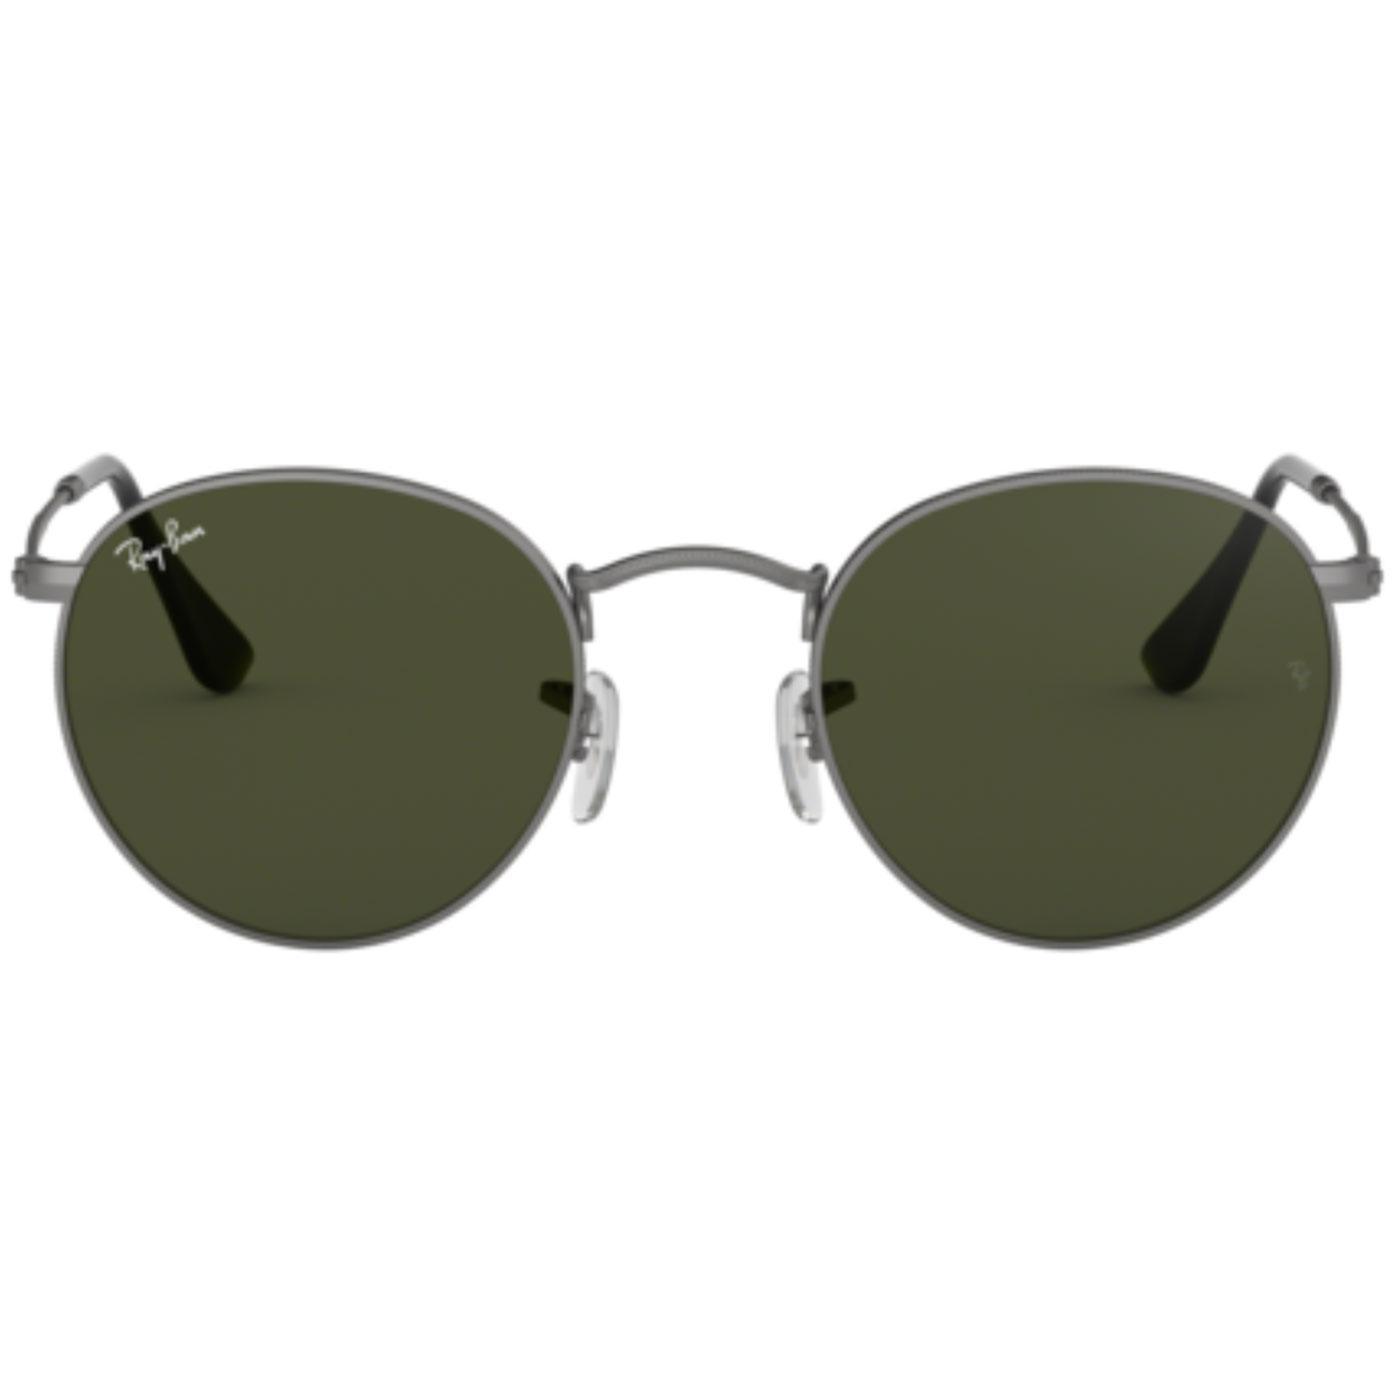 Ray-Ban Retro Mod 60s Round Sunglasses Gunmetal